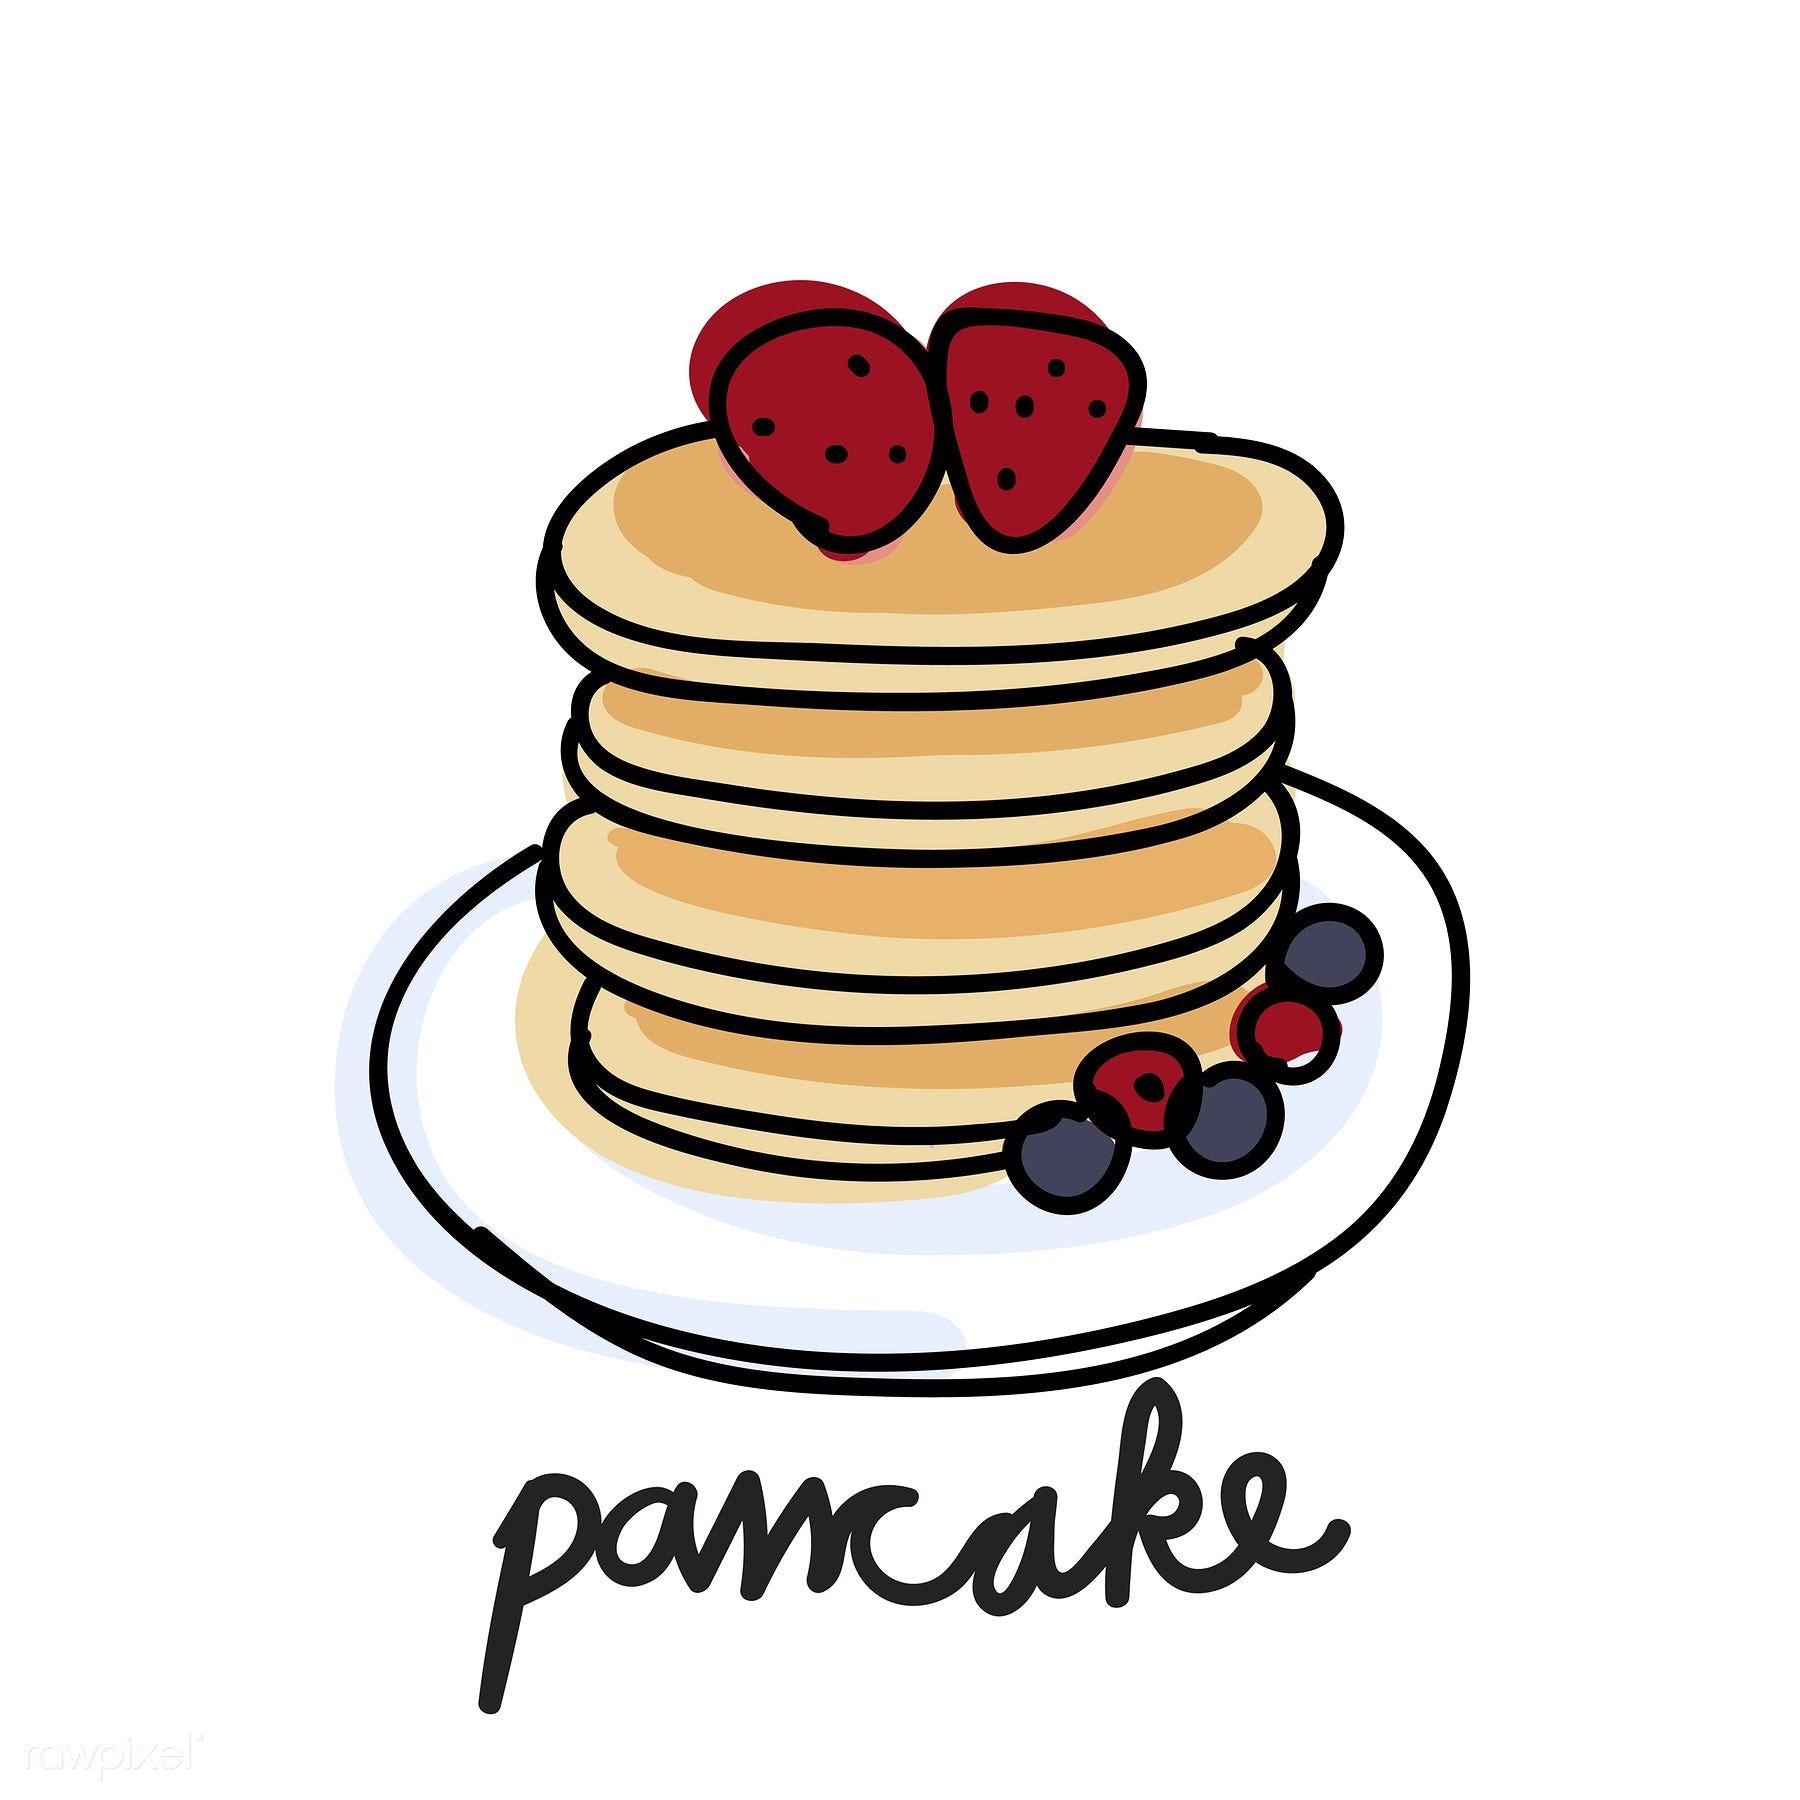 medium resolution of illustration drawing style of pancake